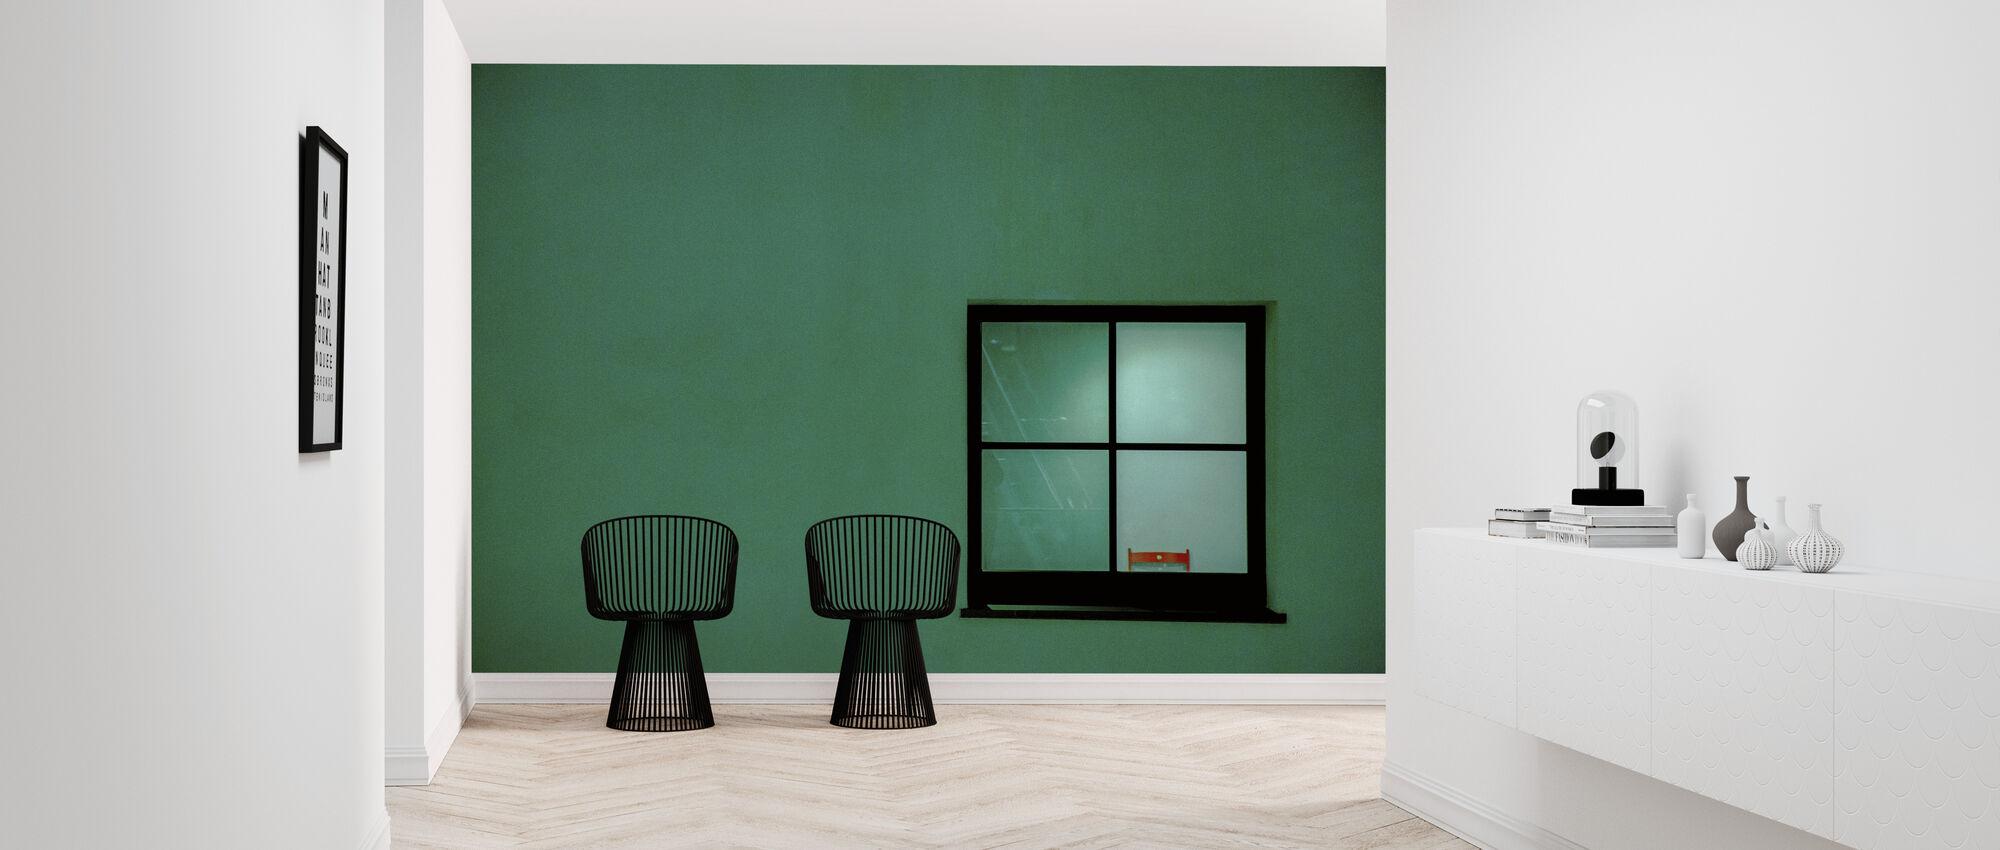 Green Window - Wallpaper - Hallway